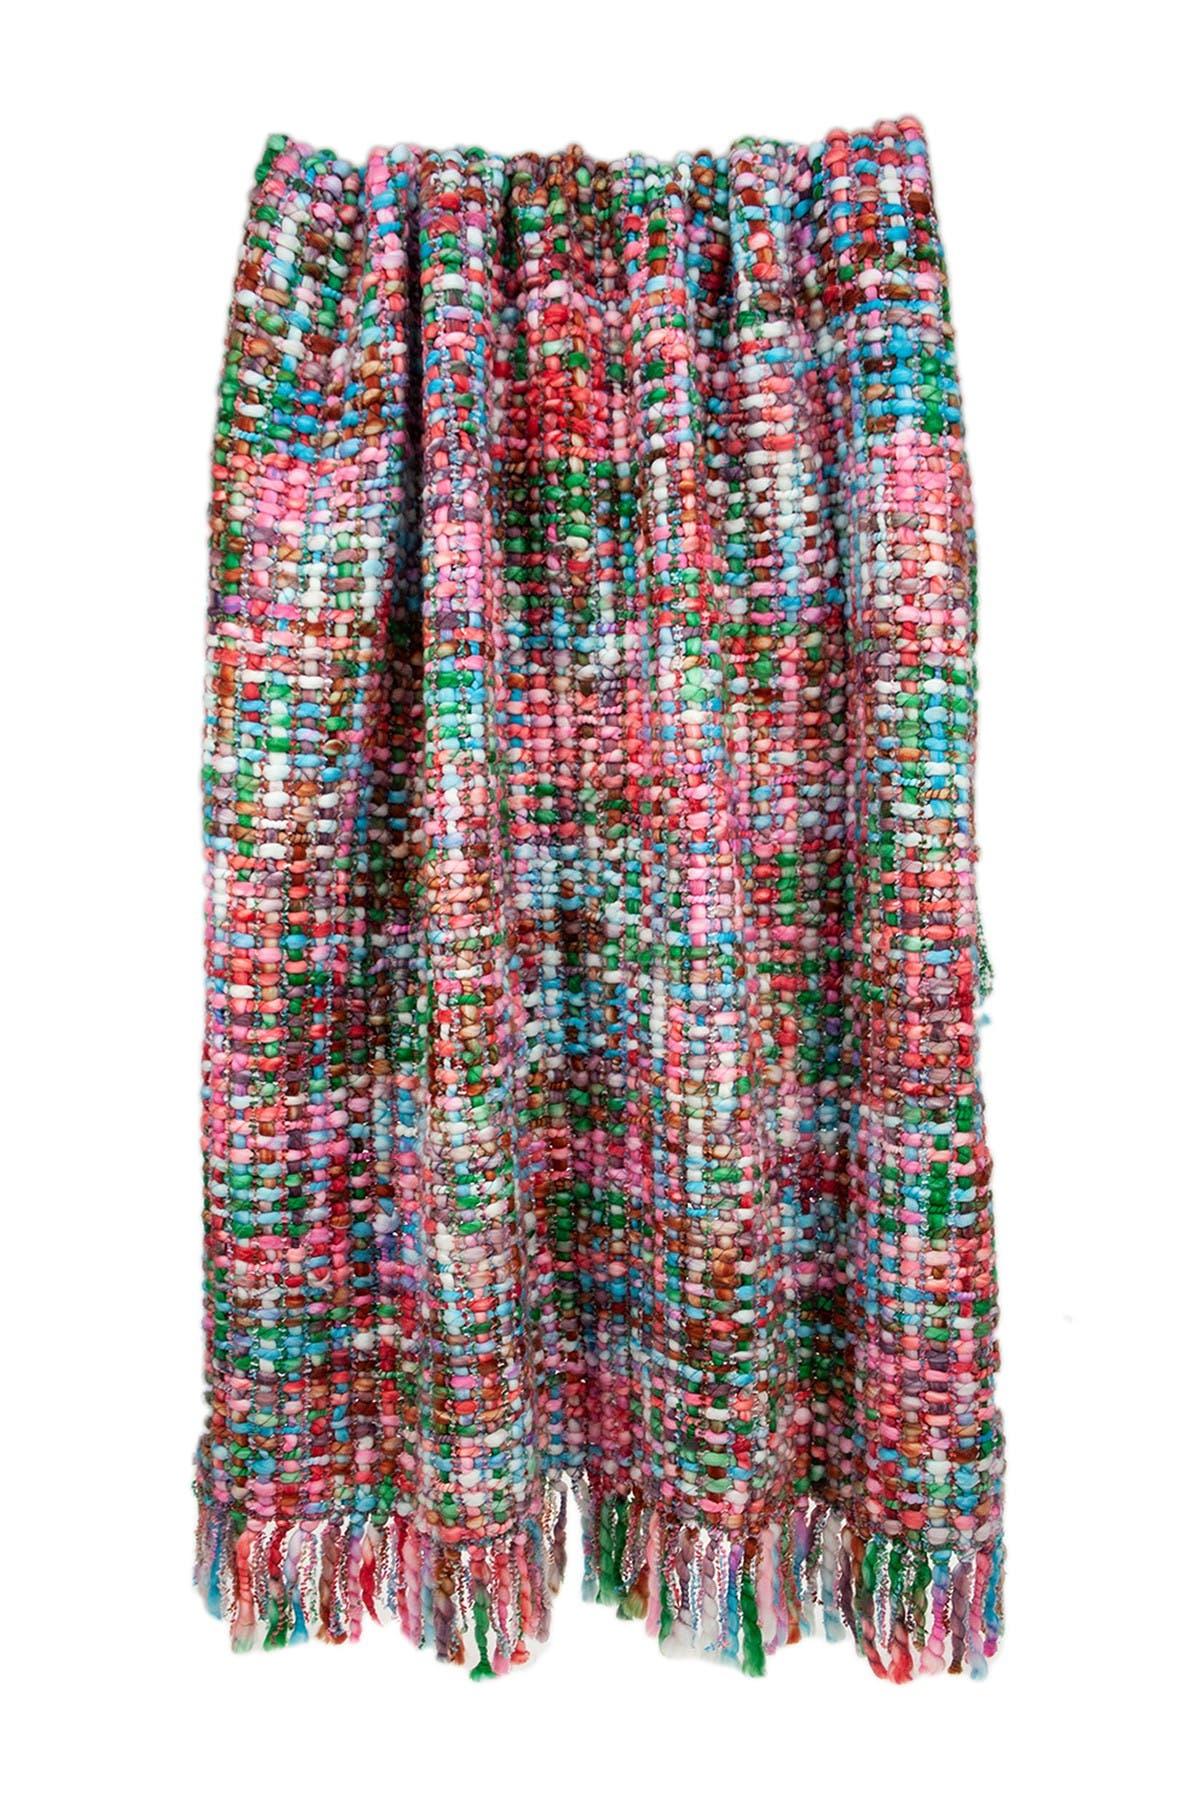 "Image of Parkland Collection Jaxson Transitional Multi 52"" x 67"" Woven Handloom Throw Blanket"